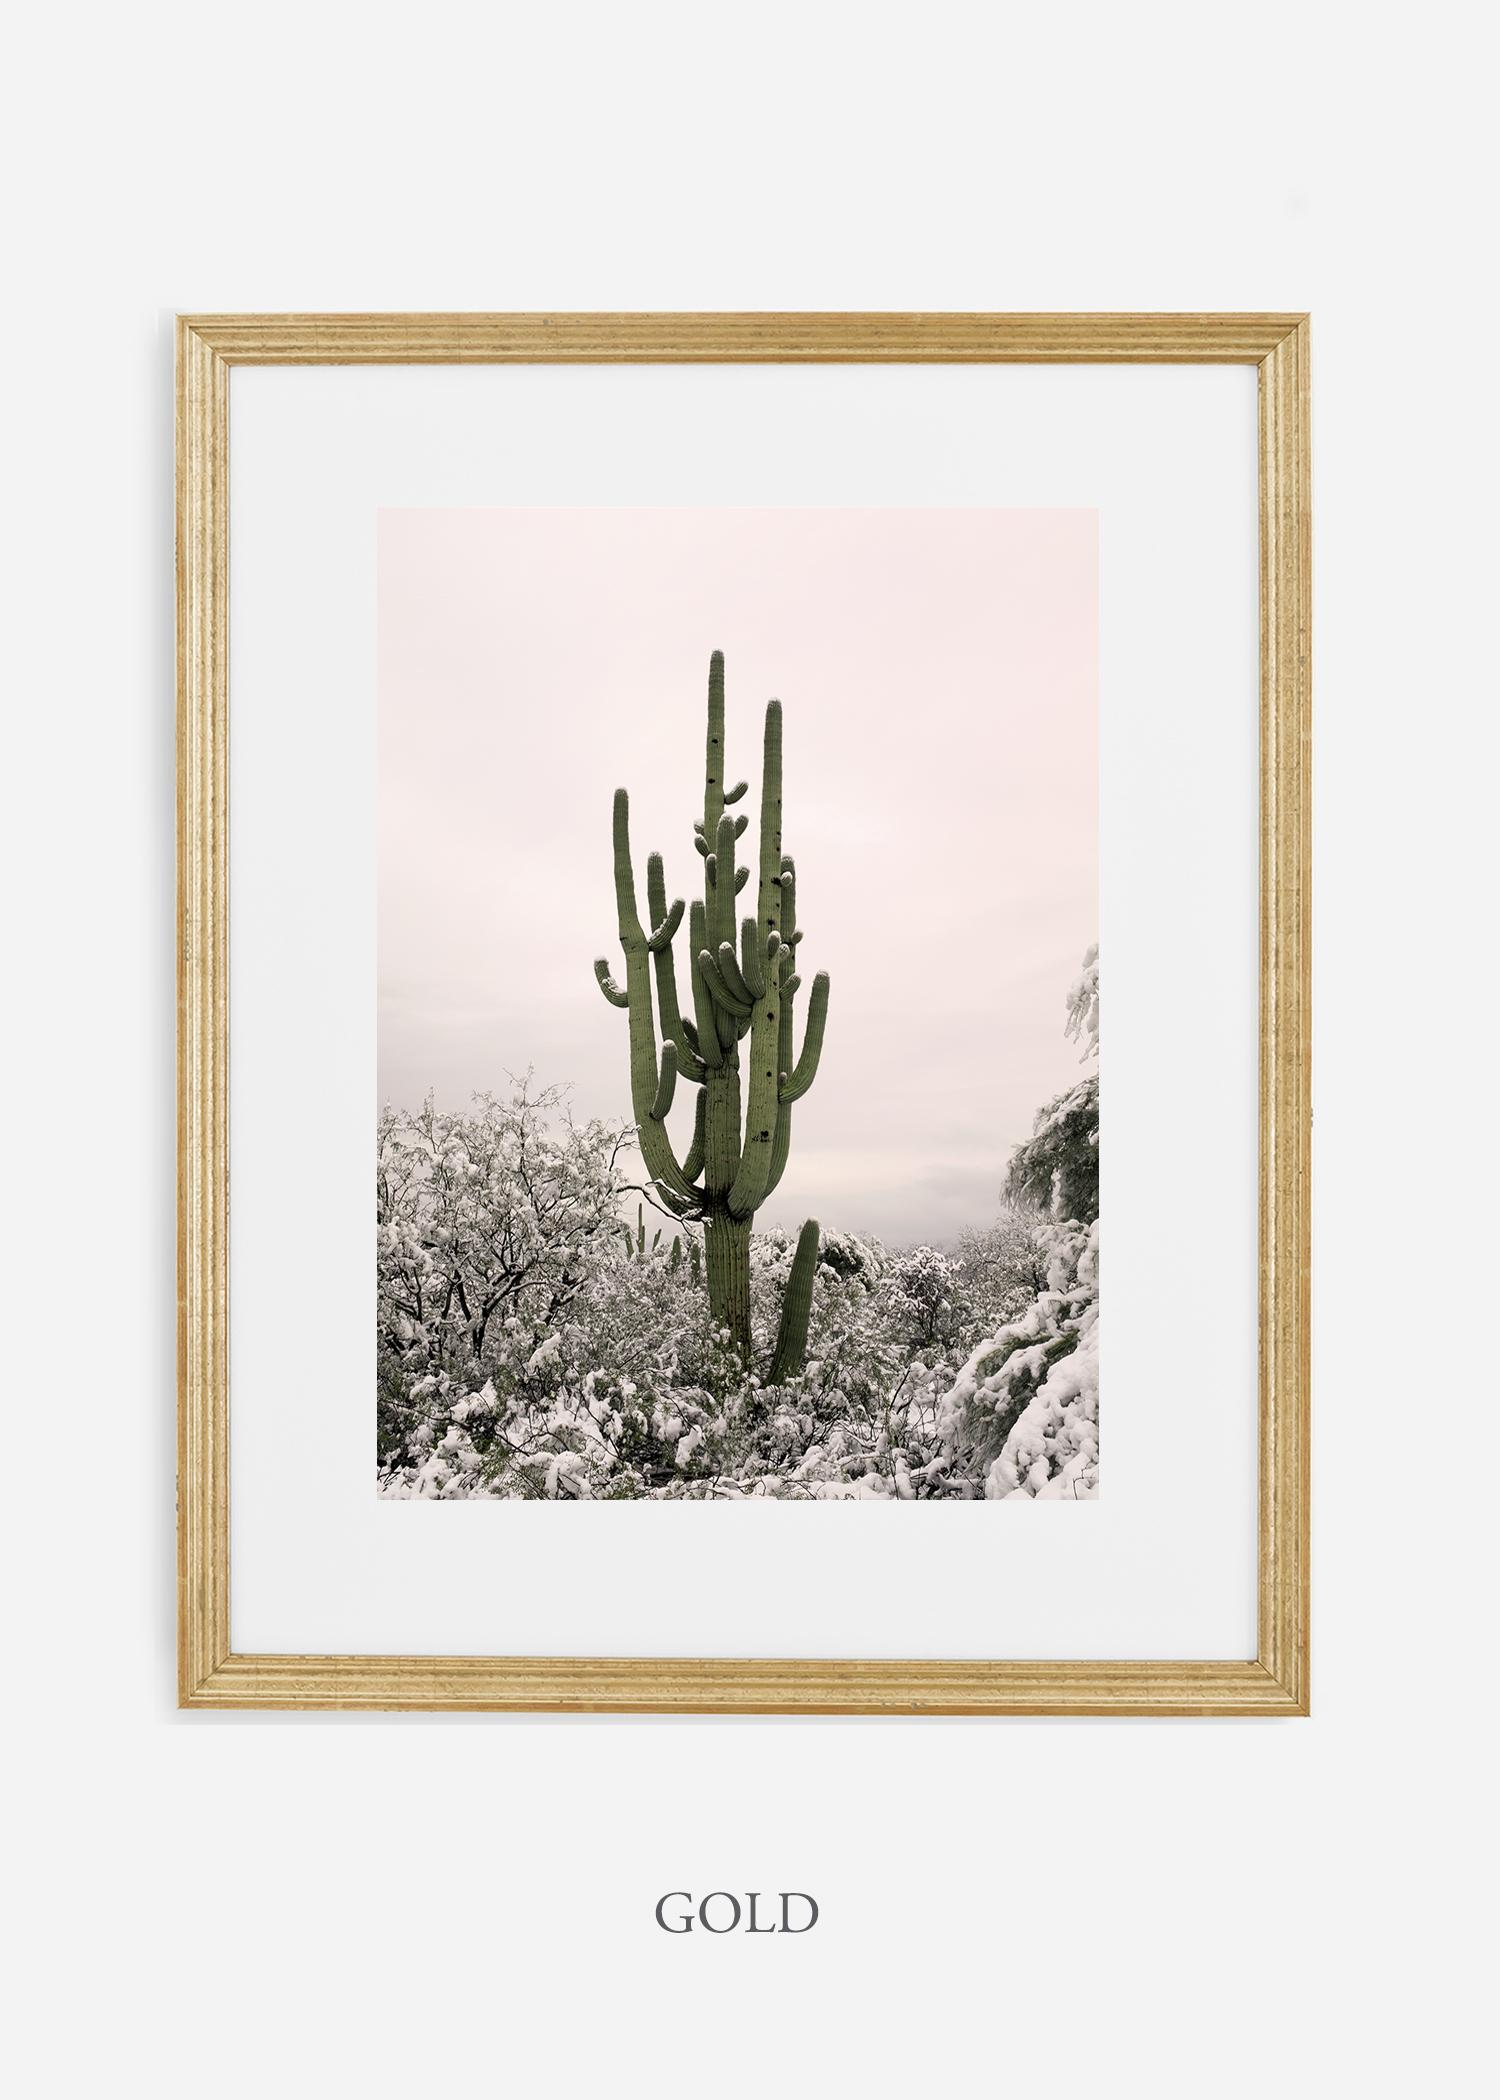 goldframe-saguaroNo.8-wildercalifornia-art-wallart-cactusprint-homedecor-prints-arizona-botanical-artwork-interiordesign.jpg